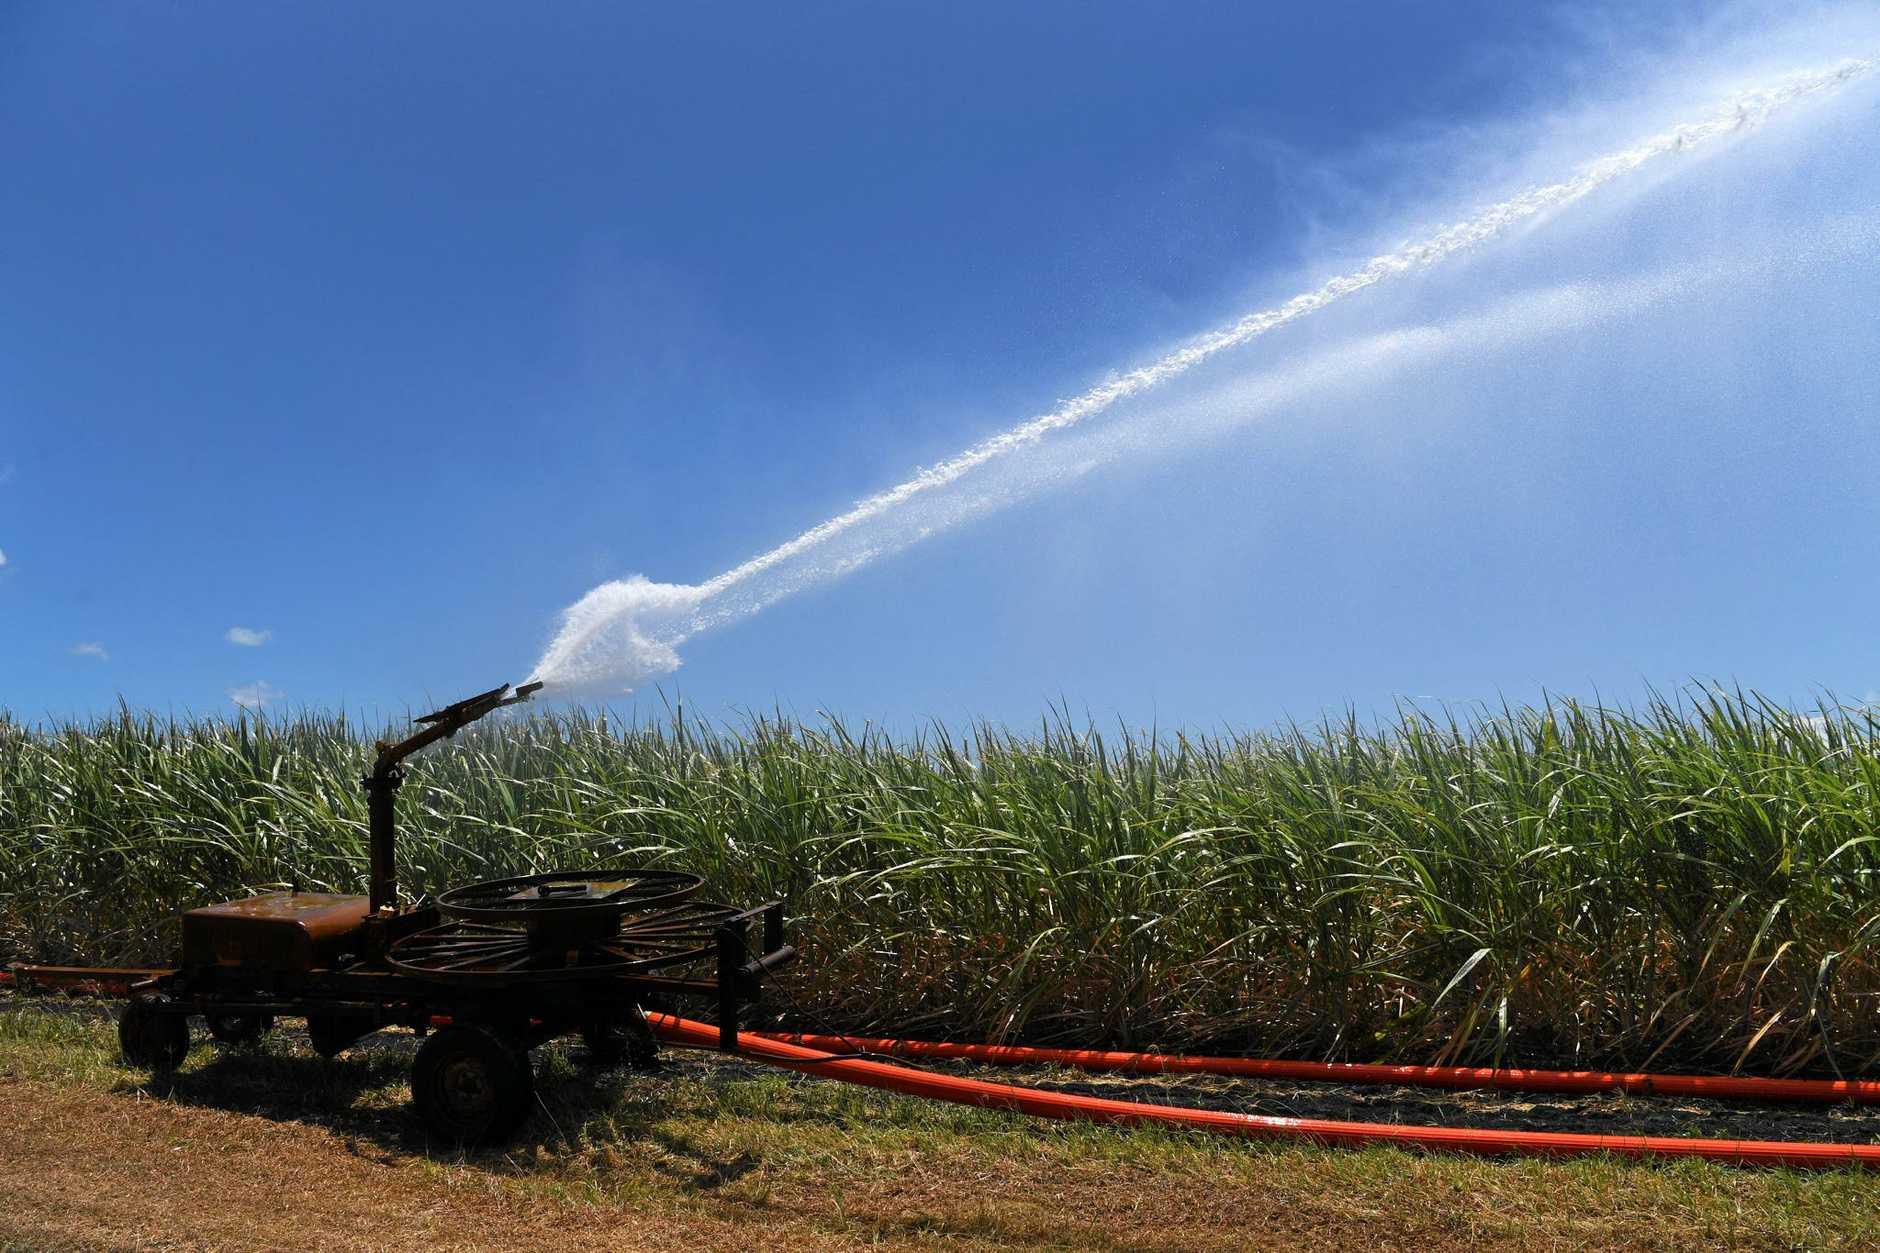 Burnett MP Stephen Bennett told the LNP State Convention increasing power prices had left irrigators